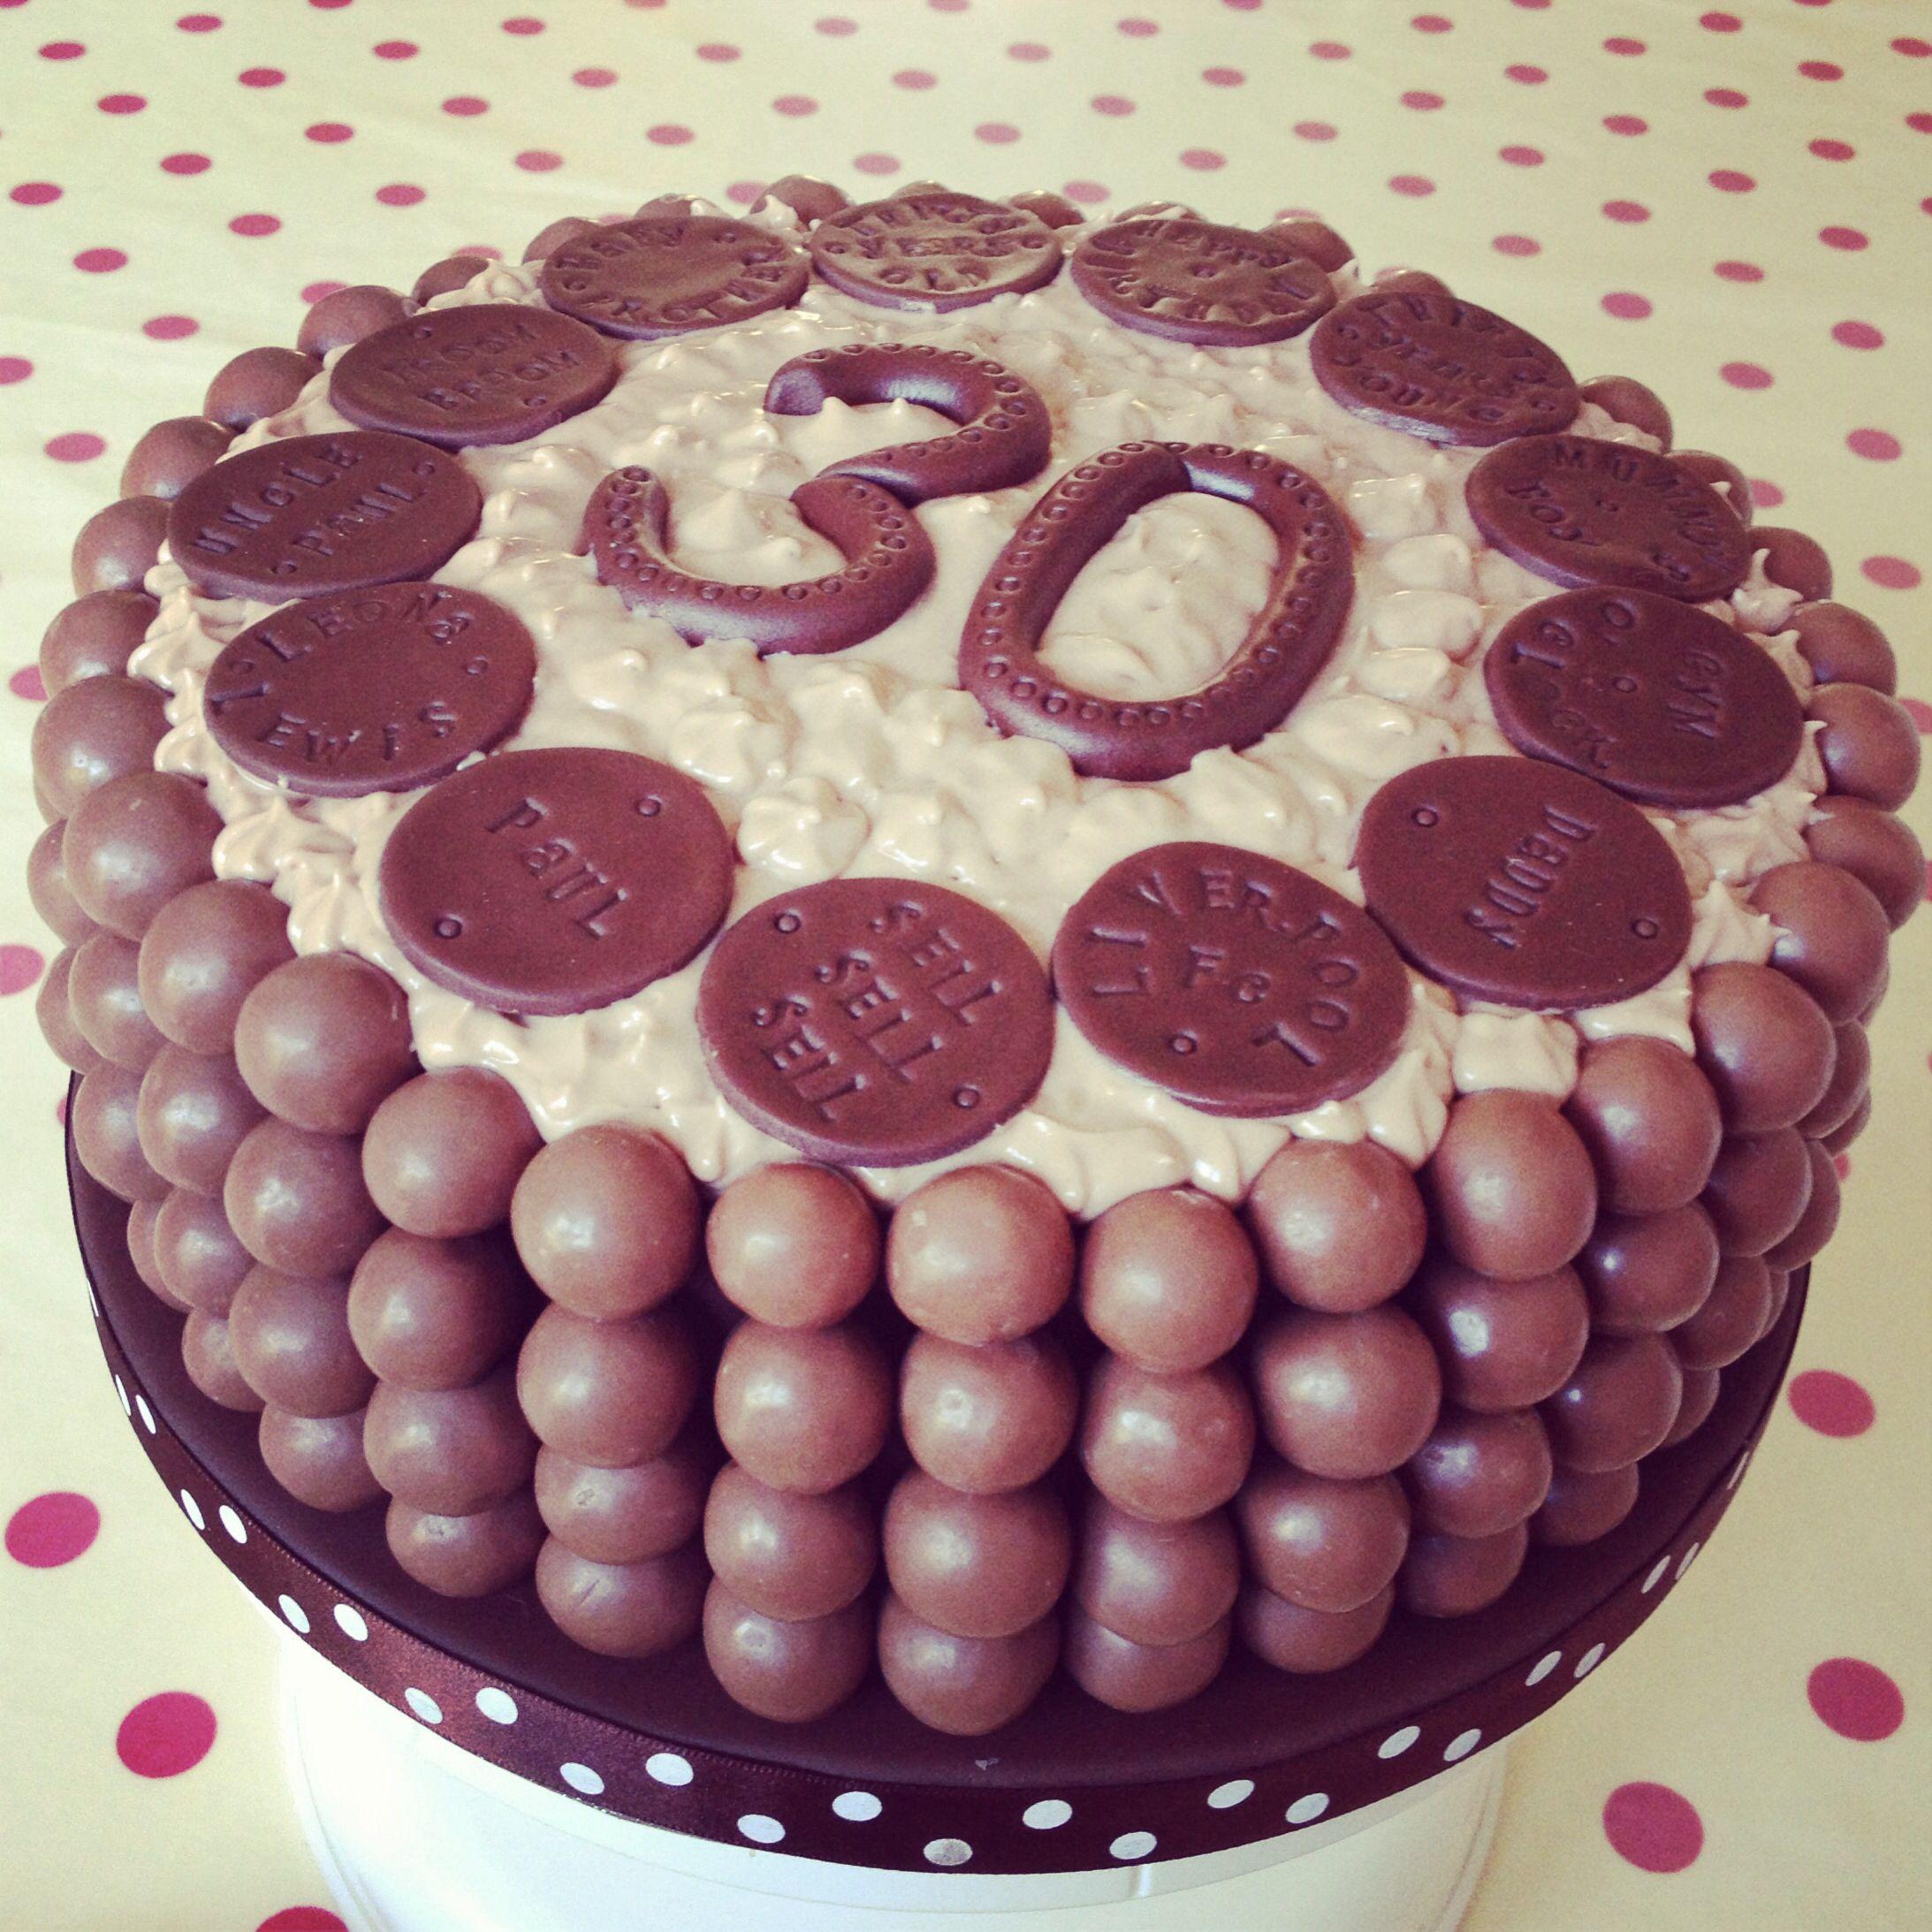 Maltesers Cake 30th Birthday Cake with personalised chocolate